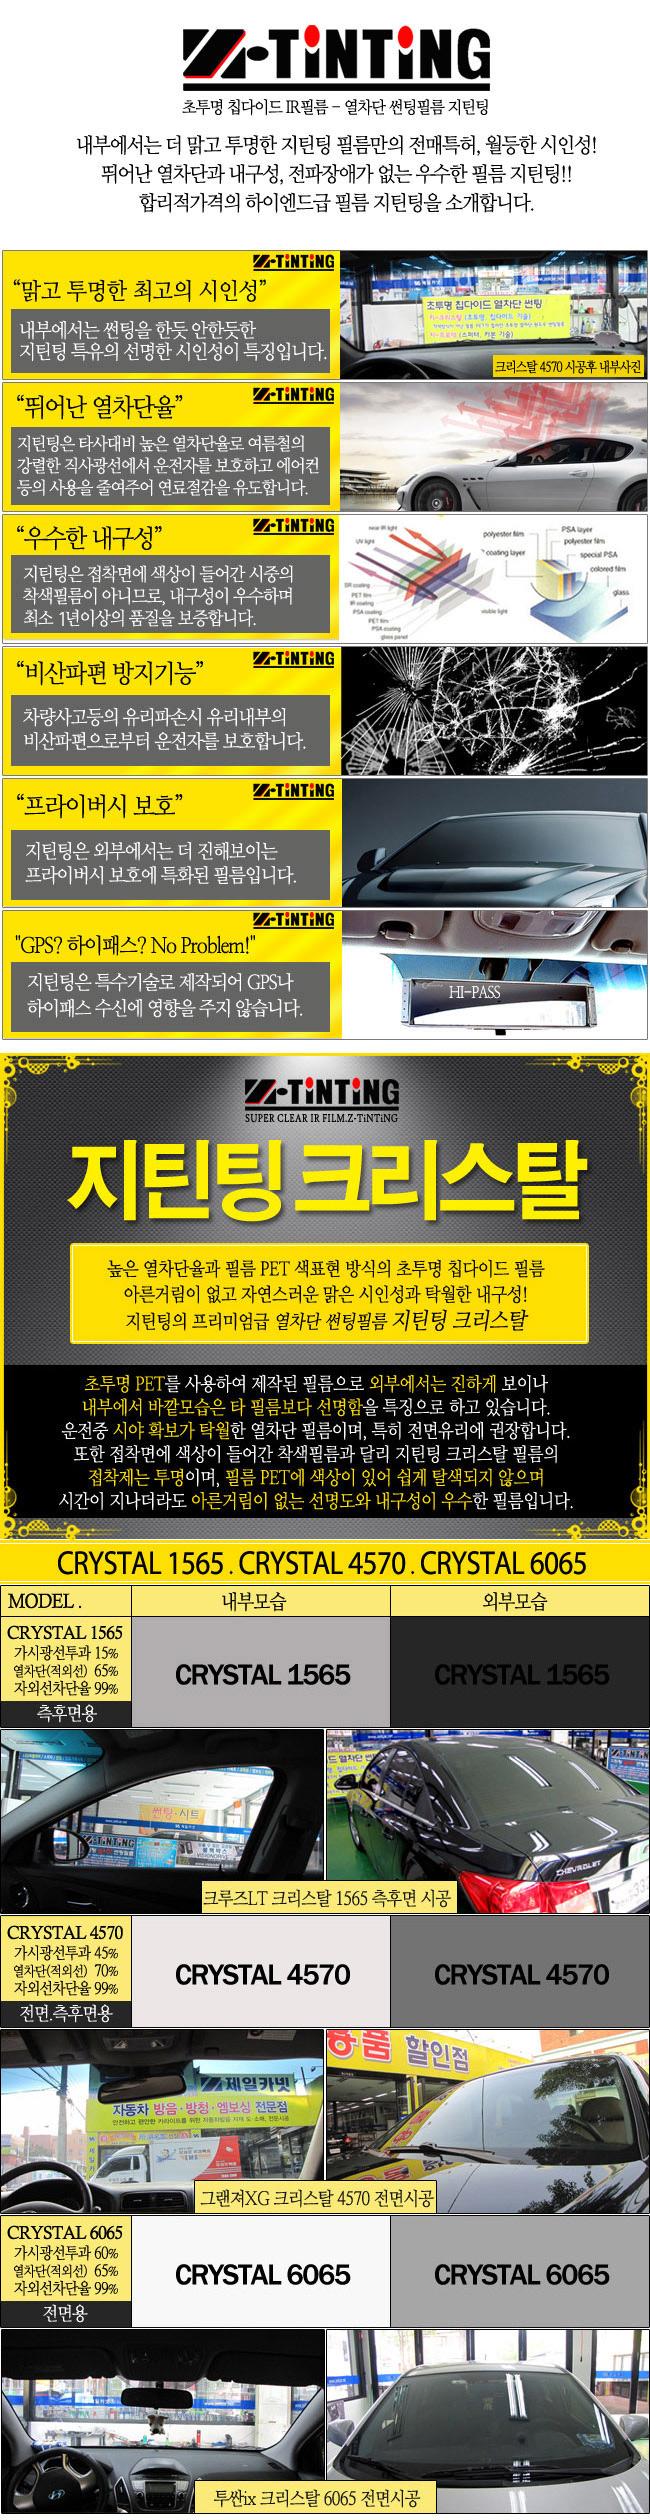 z-crystal, z-protech 열차단 썬팅필름